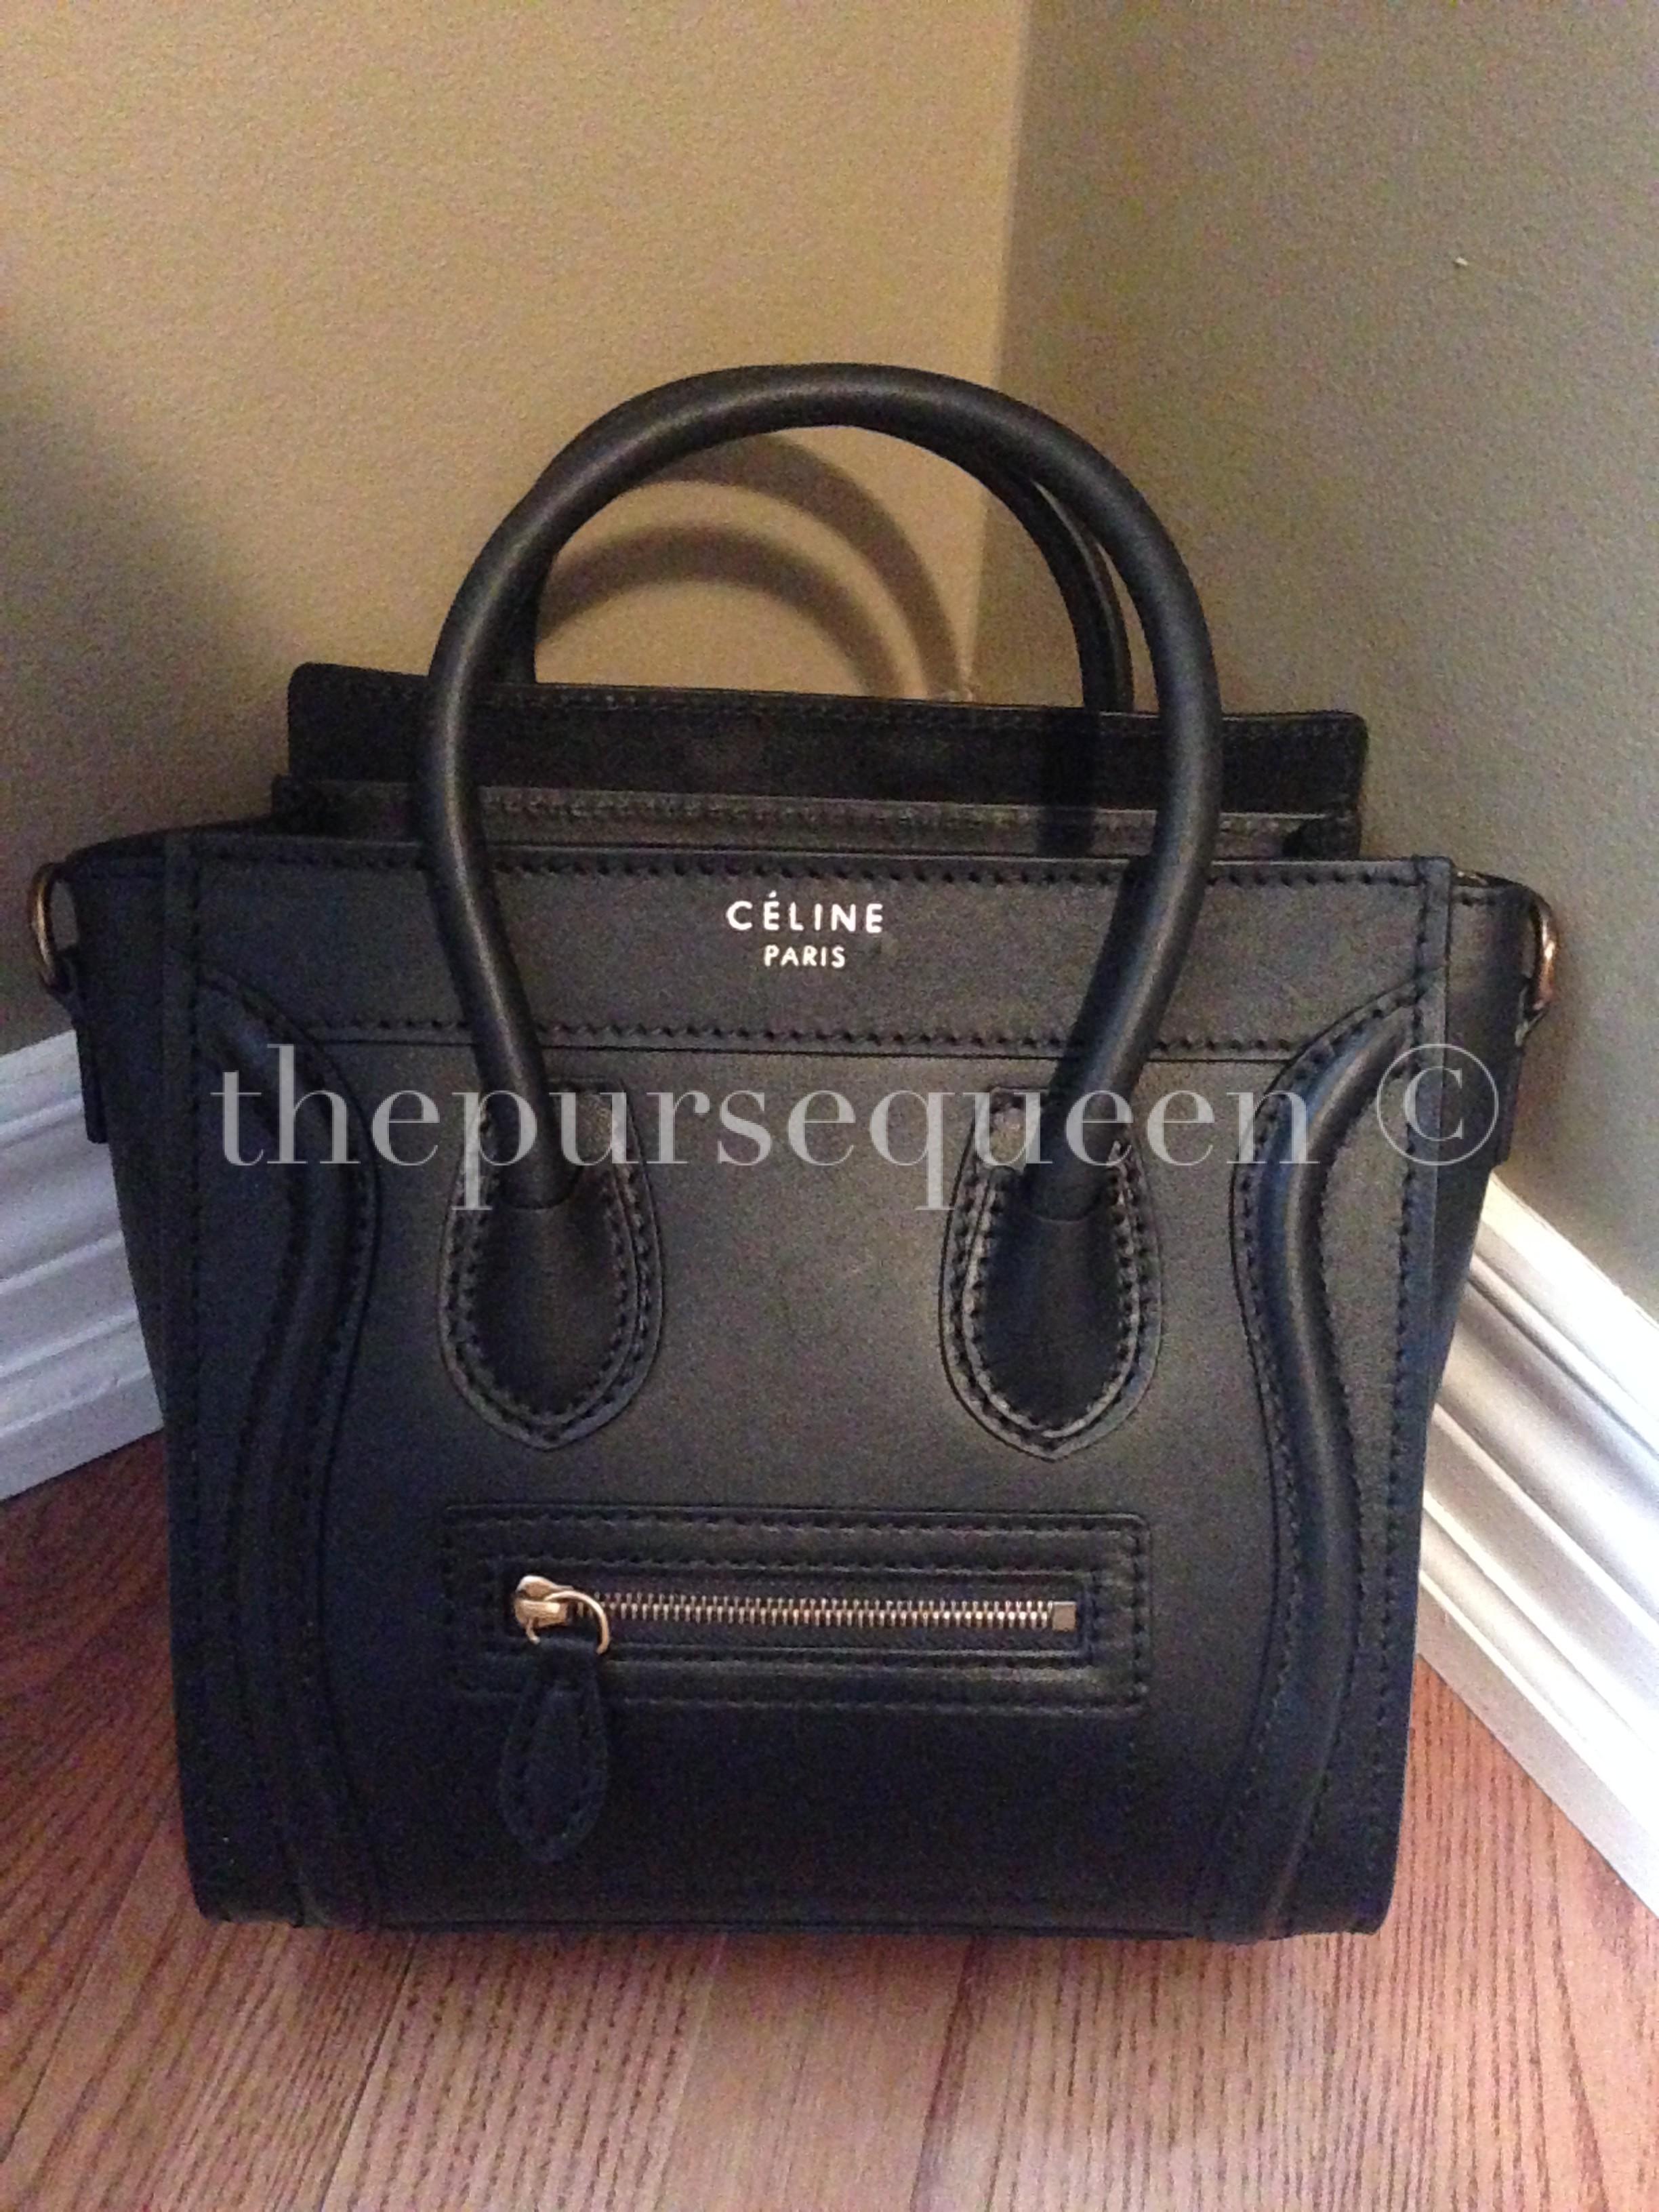 81fa5a1848 Celine Archives - Page 2 of 2 - Authentic   Replica Handbag Reviews ...